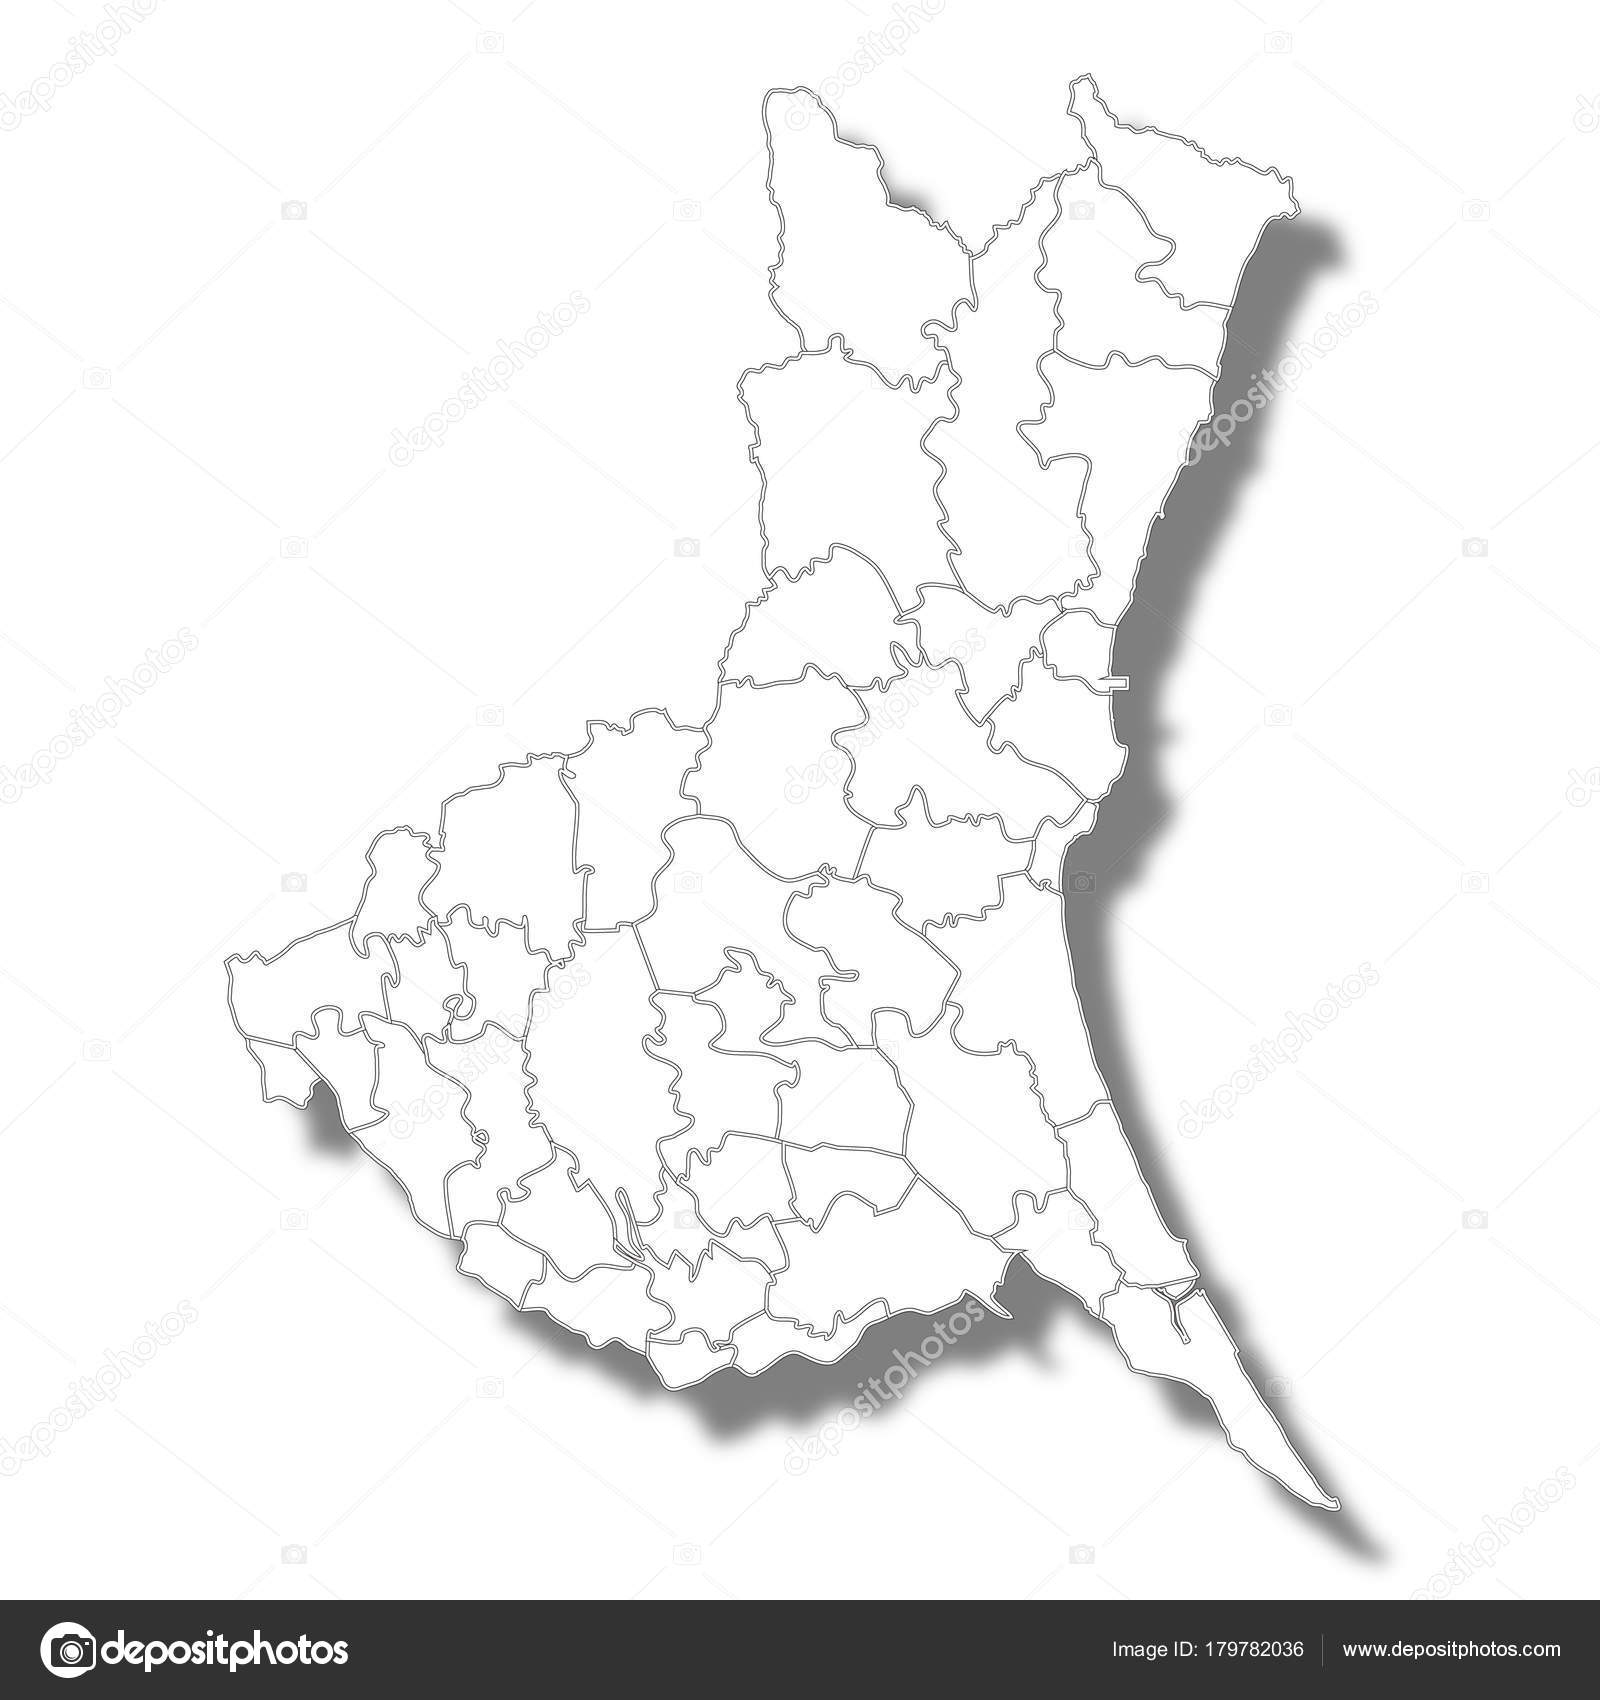 Ibaraki Japan Map.Ibaraki Prefecture Japan Map White Icon Stock Vector C Jboy24